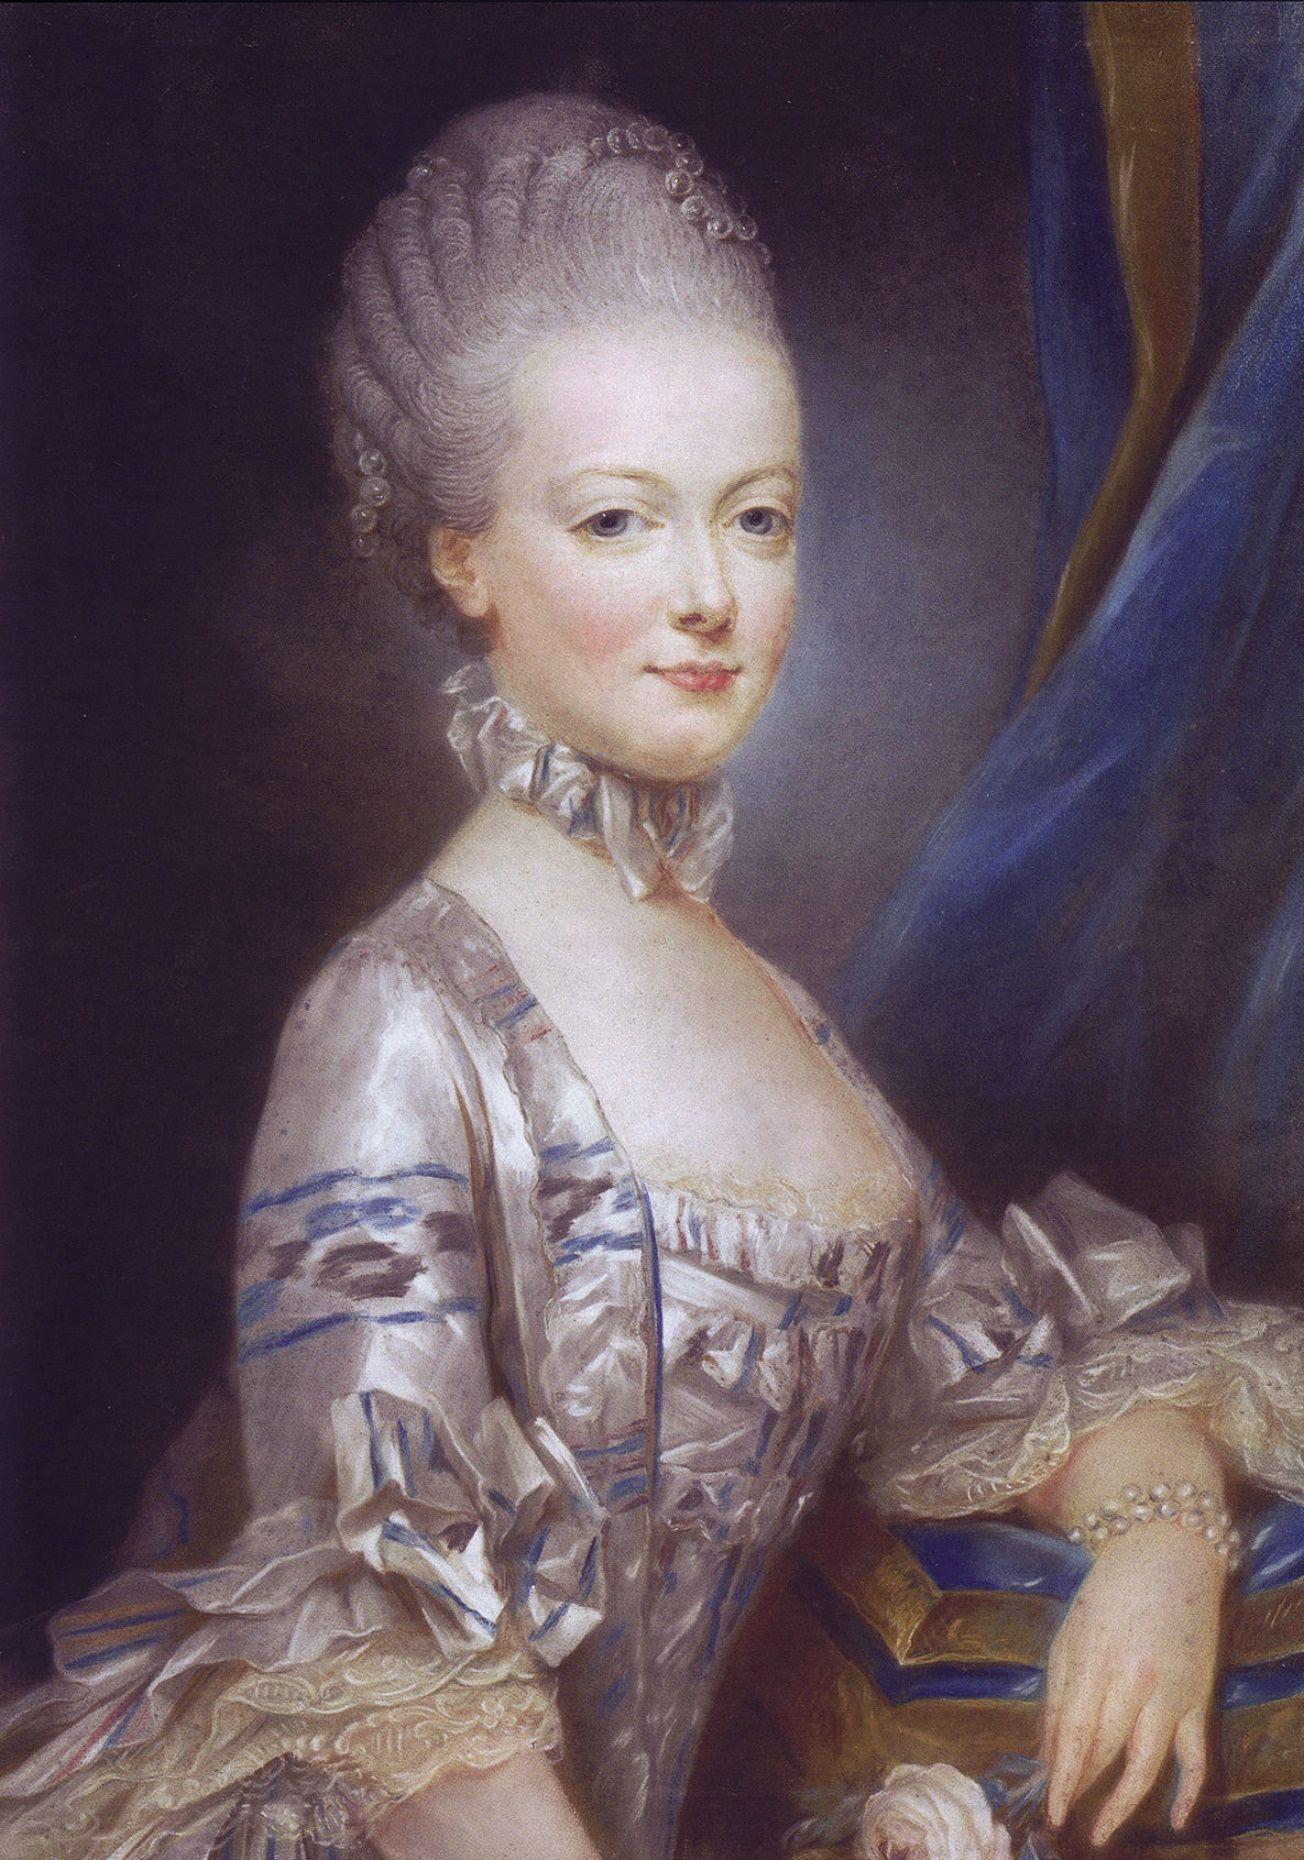 Queen Marie Antoinette of France by Joseph Ducreux